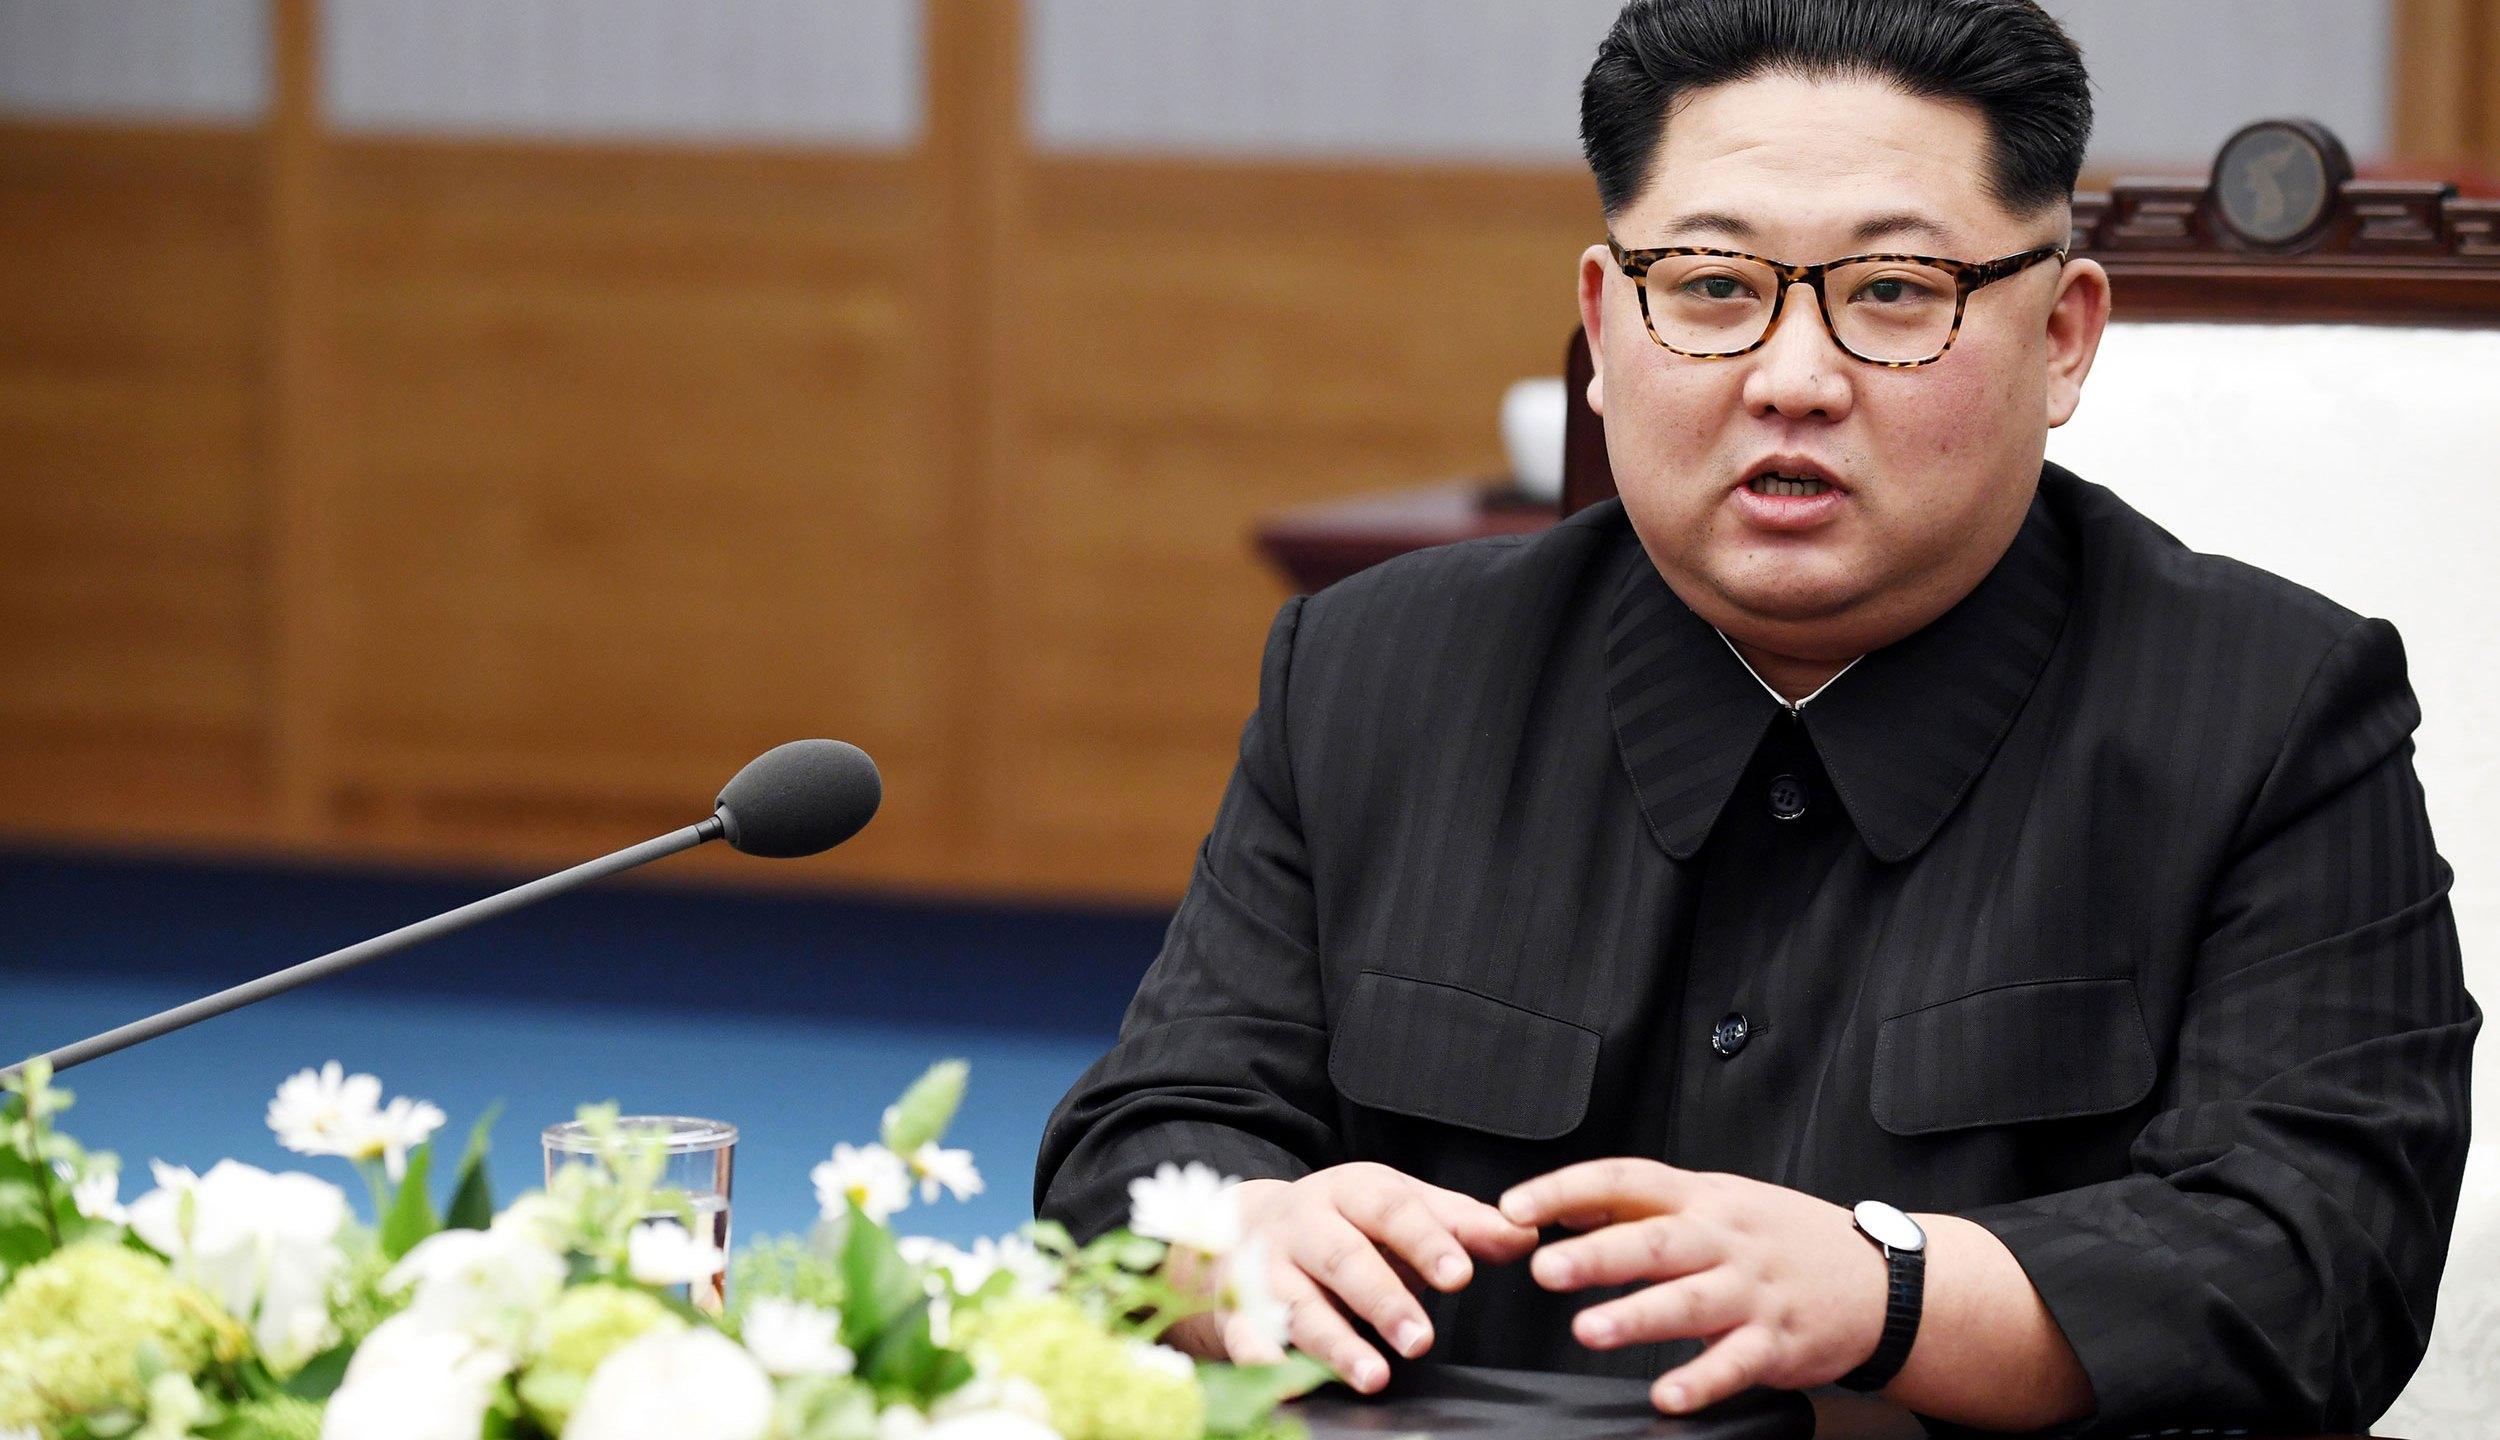 Kim Jong Un (Photo by Korea Summit Press Pool/Getty Images)